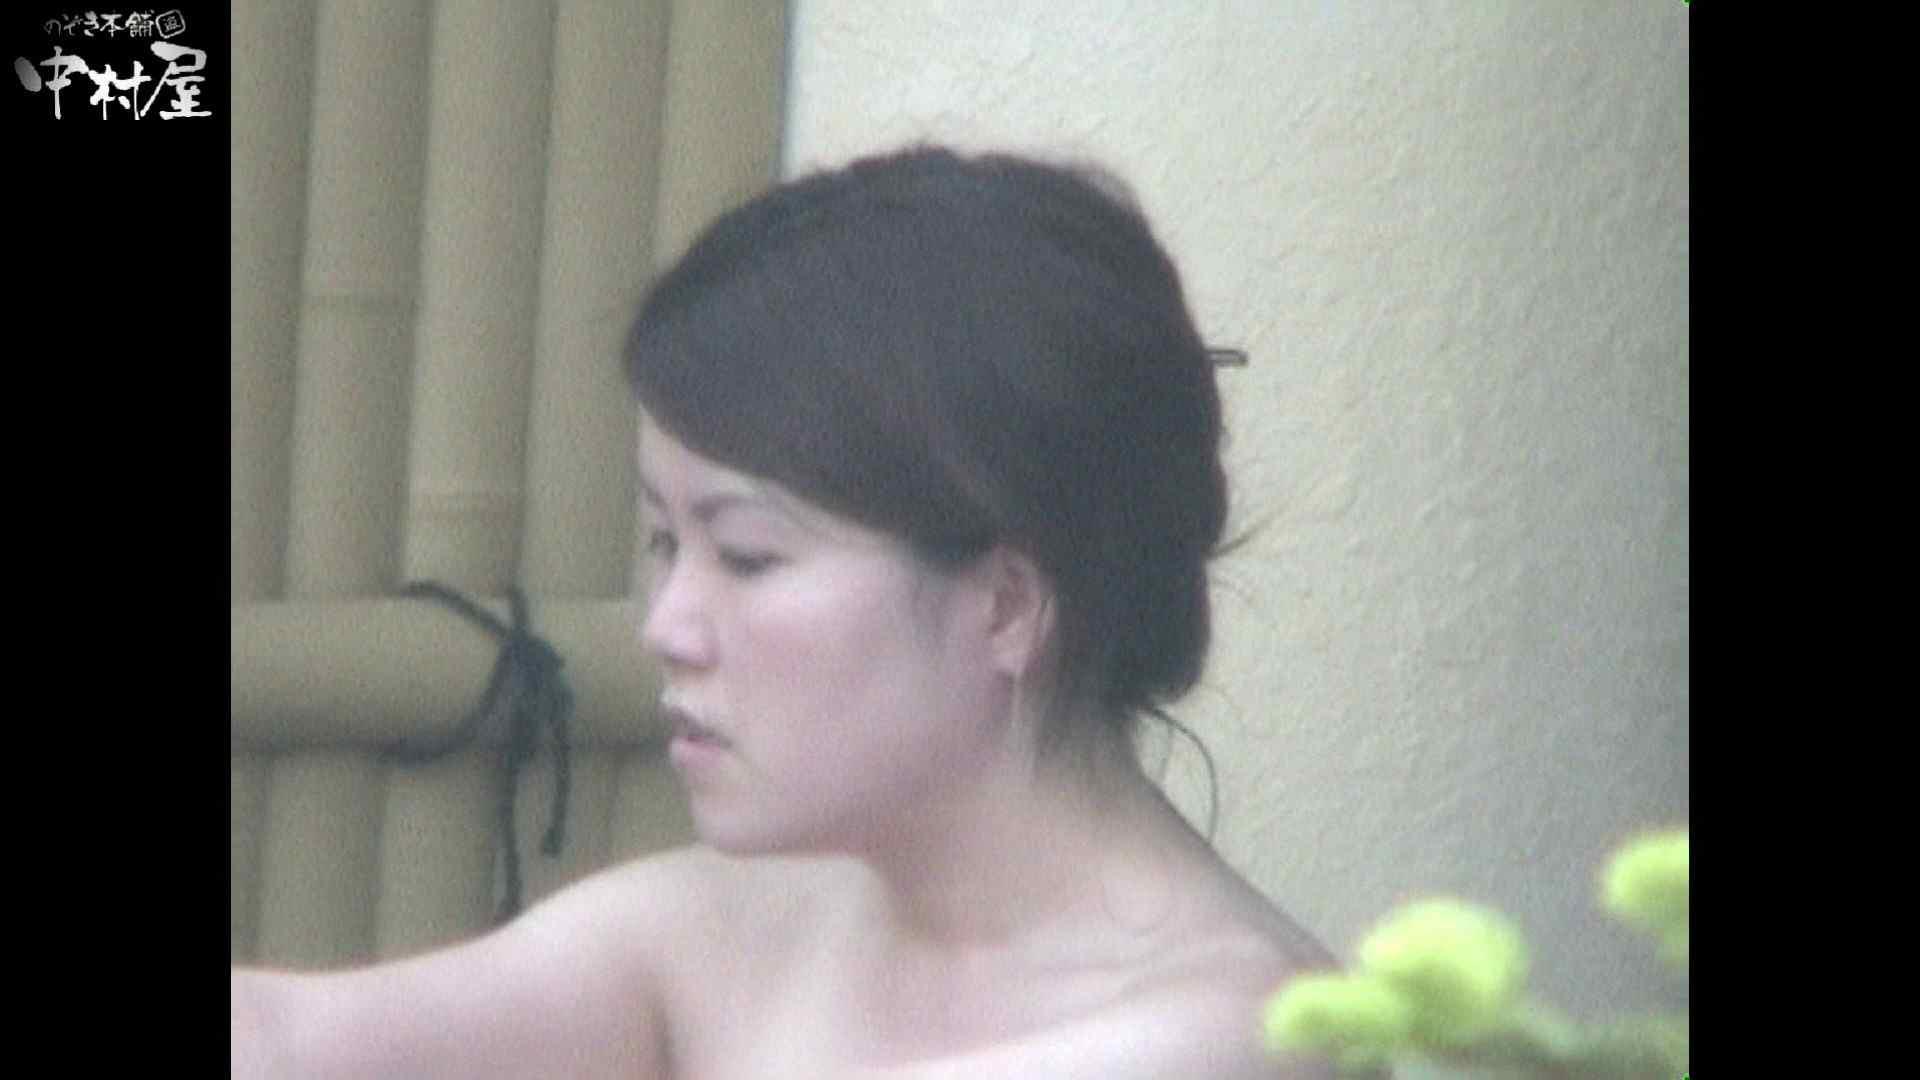 Aquaな露天風呂Vol.935 OLのエロ生活 性交動画流出 32連発 5